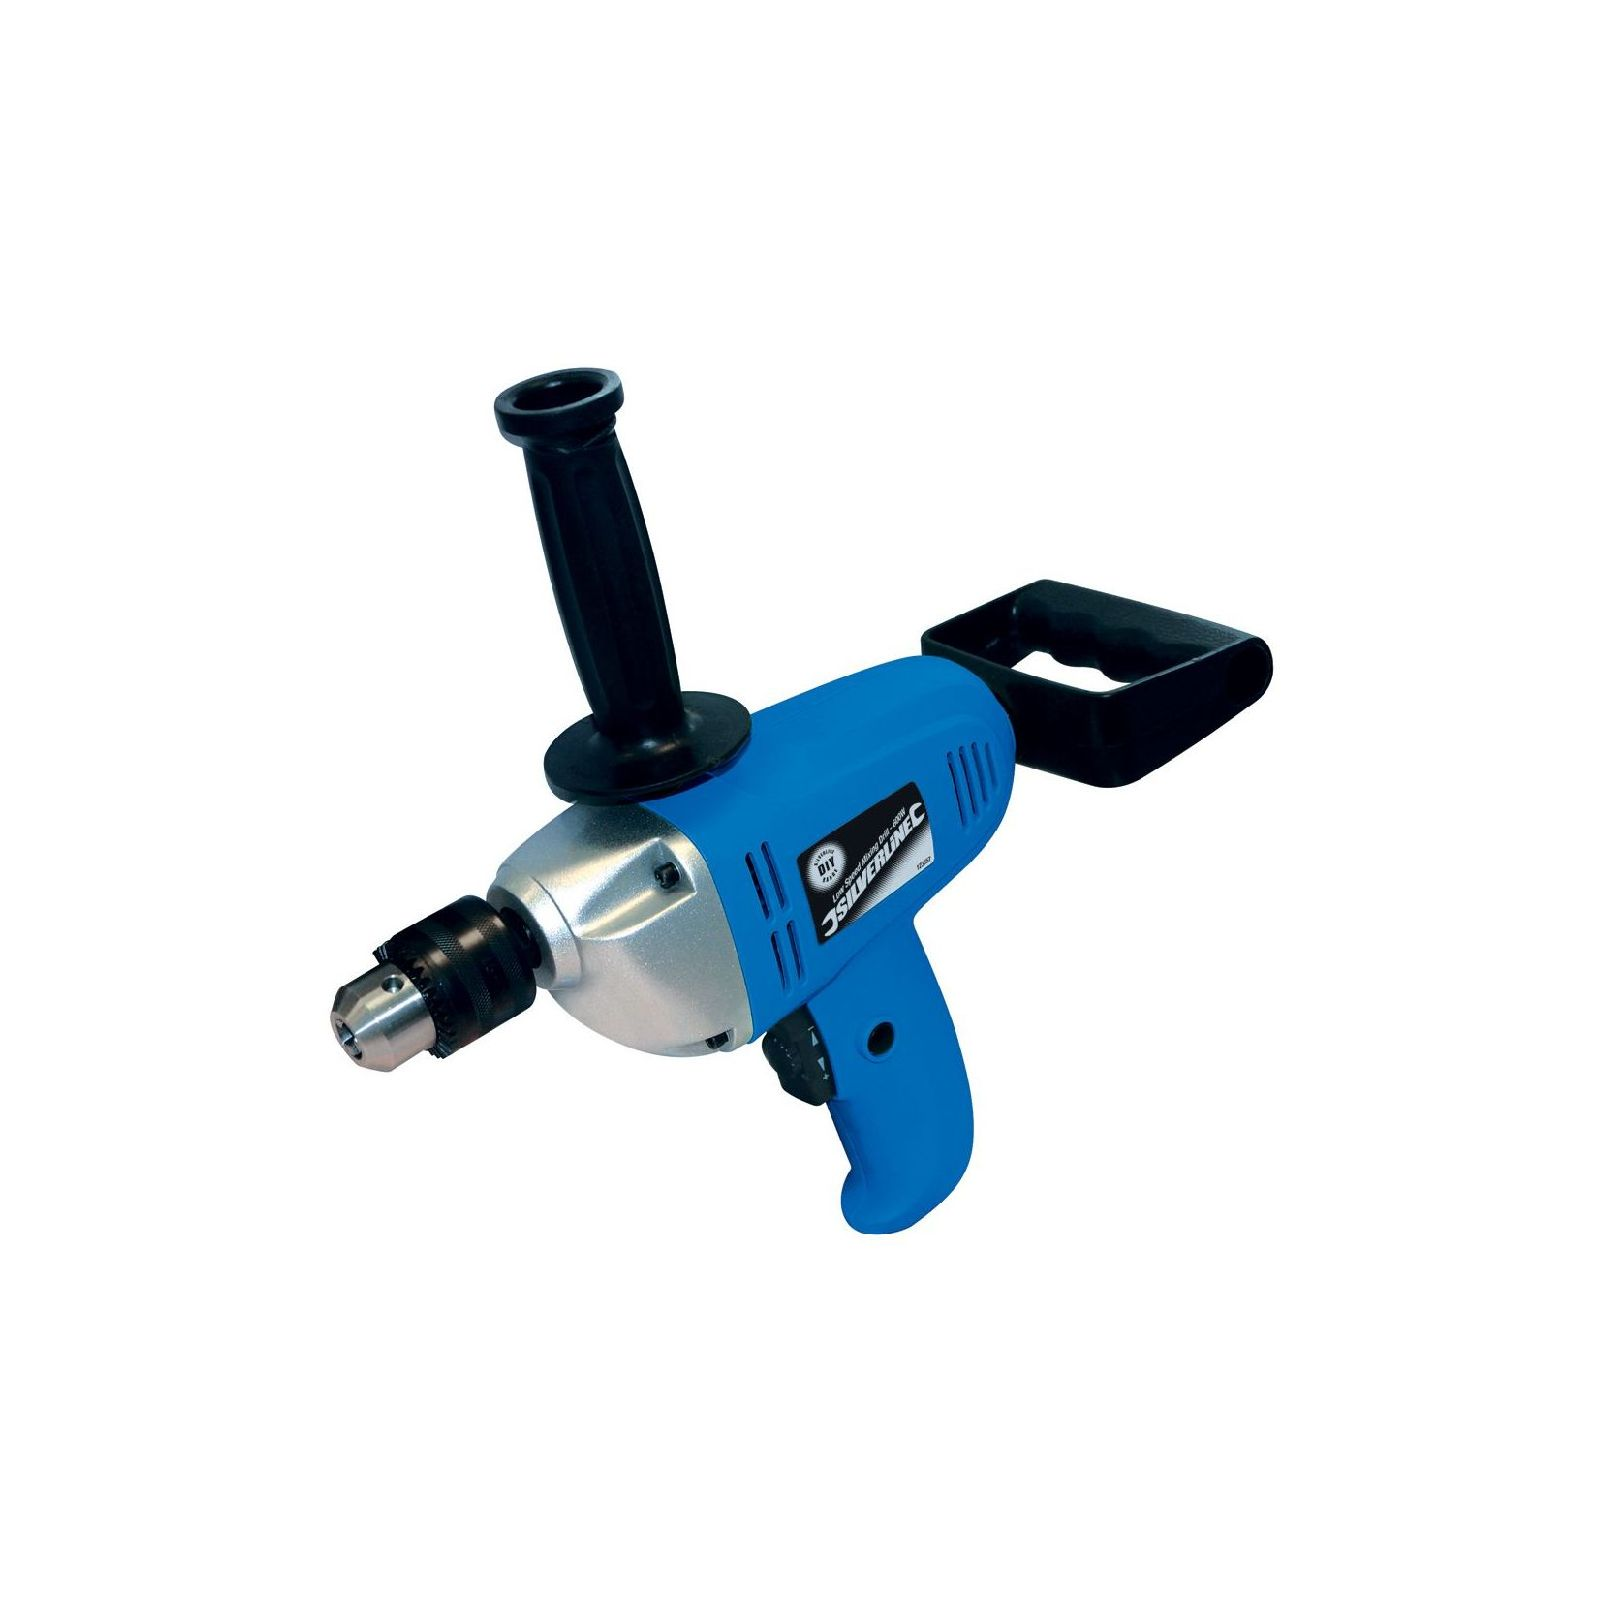 Silverline Mixing Drill Low Speed 600w Power 123557 Ebay